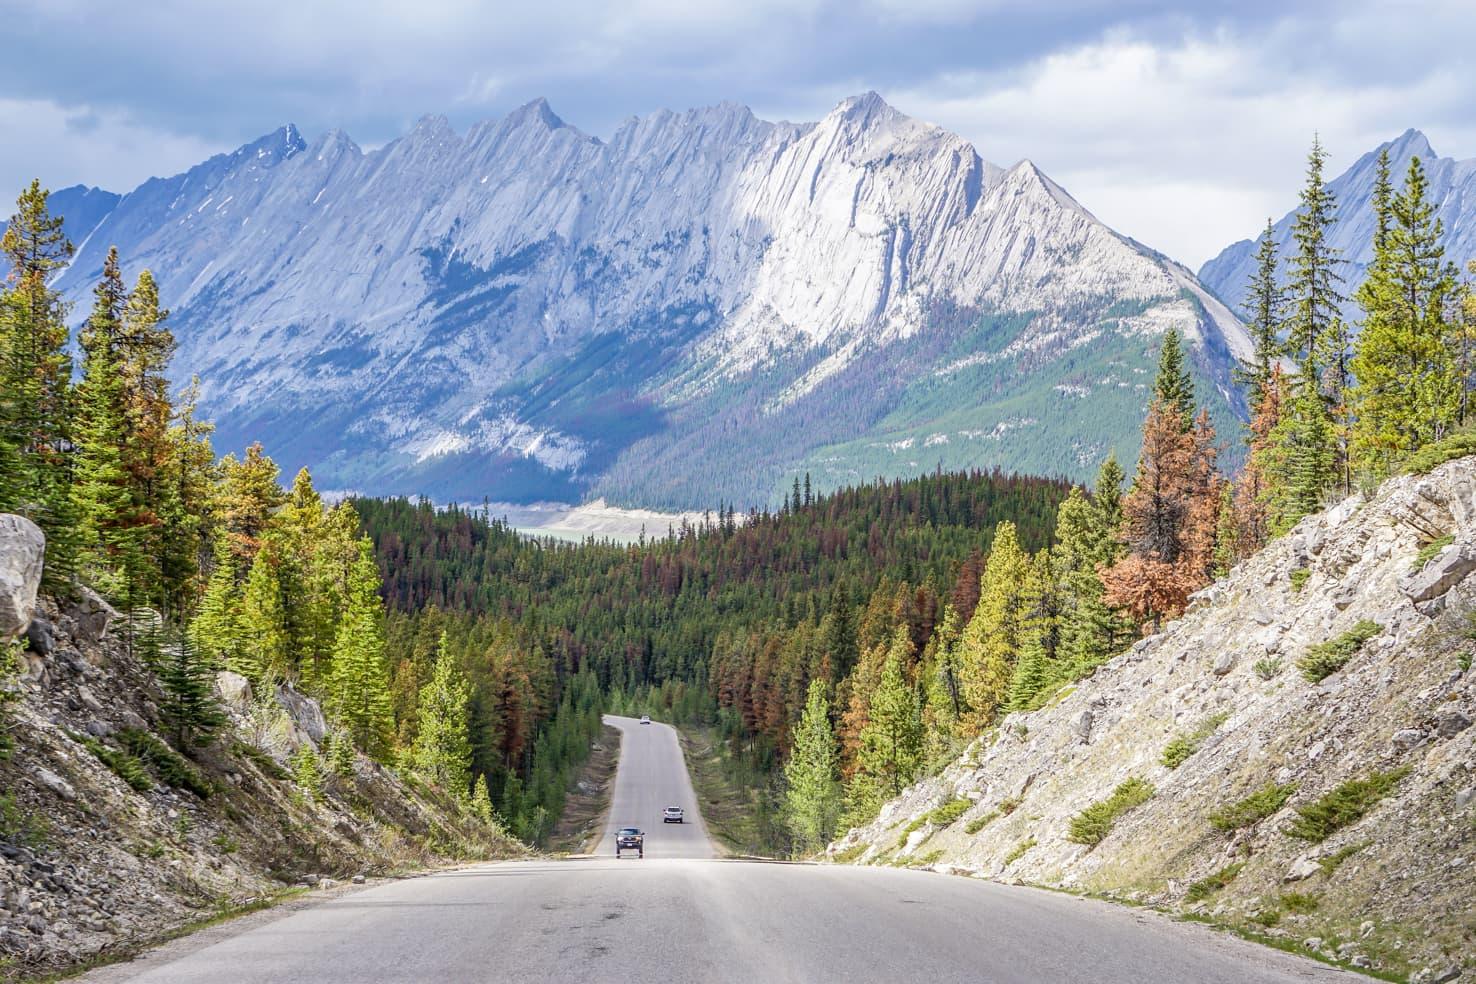 Bald Hills Hike in Jasper National Park